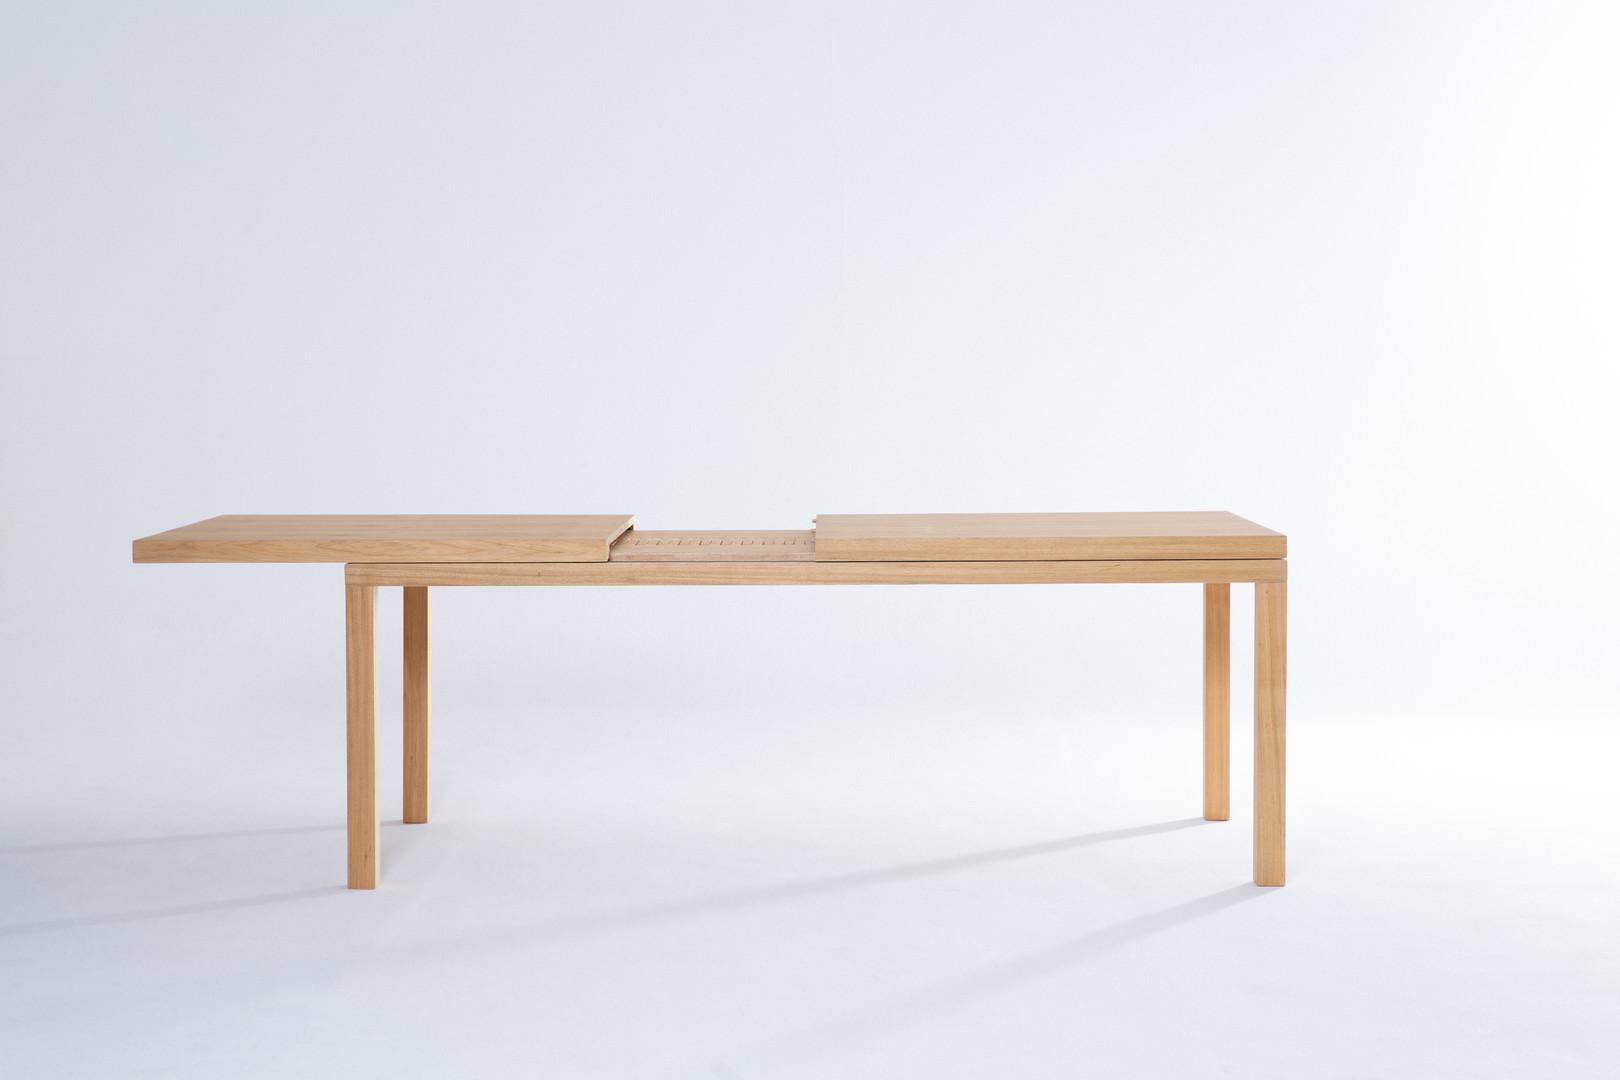 Mesa pente abrindo 1.jpg